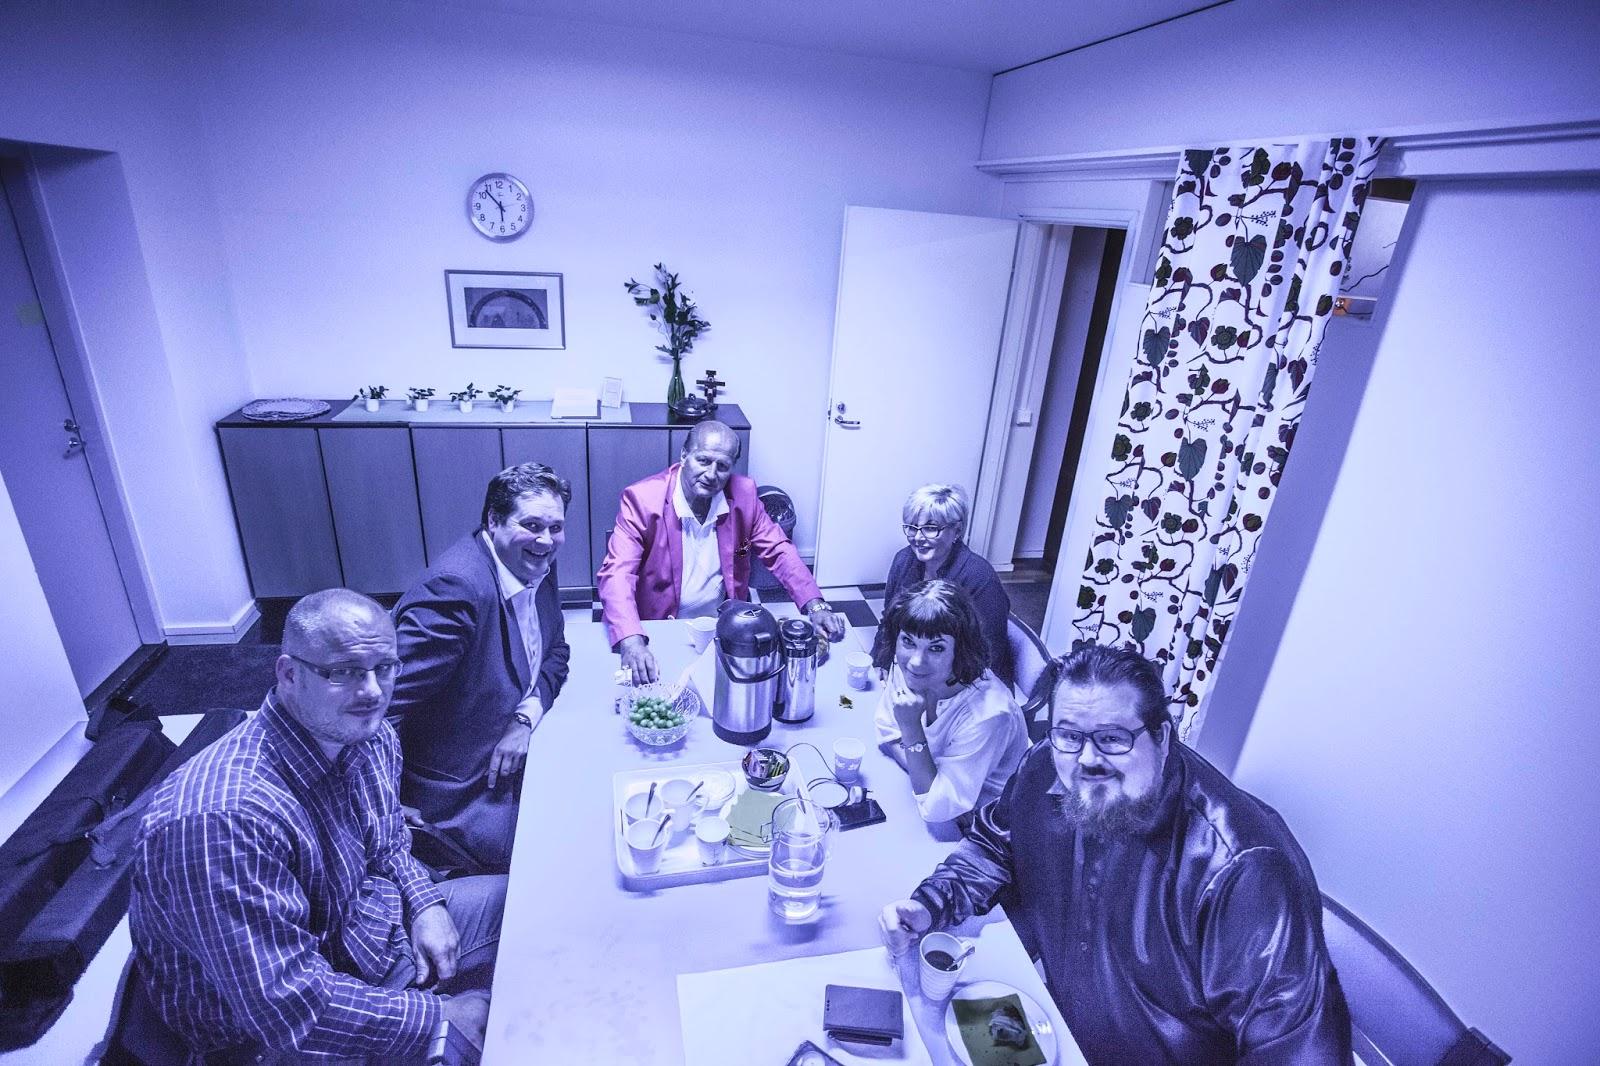 Back to business 11.9.2014 Turku, Sinitaivassali - Backstage1.jpg